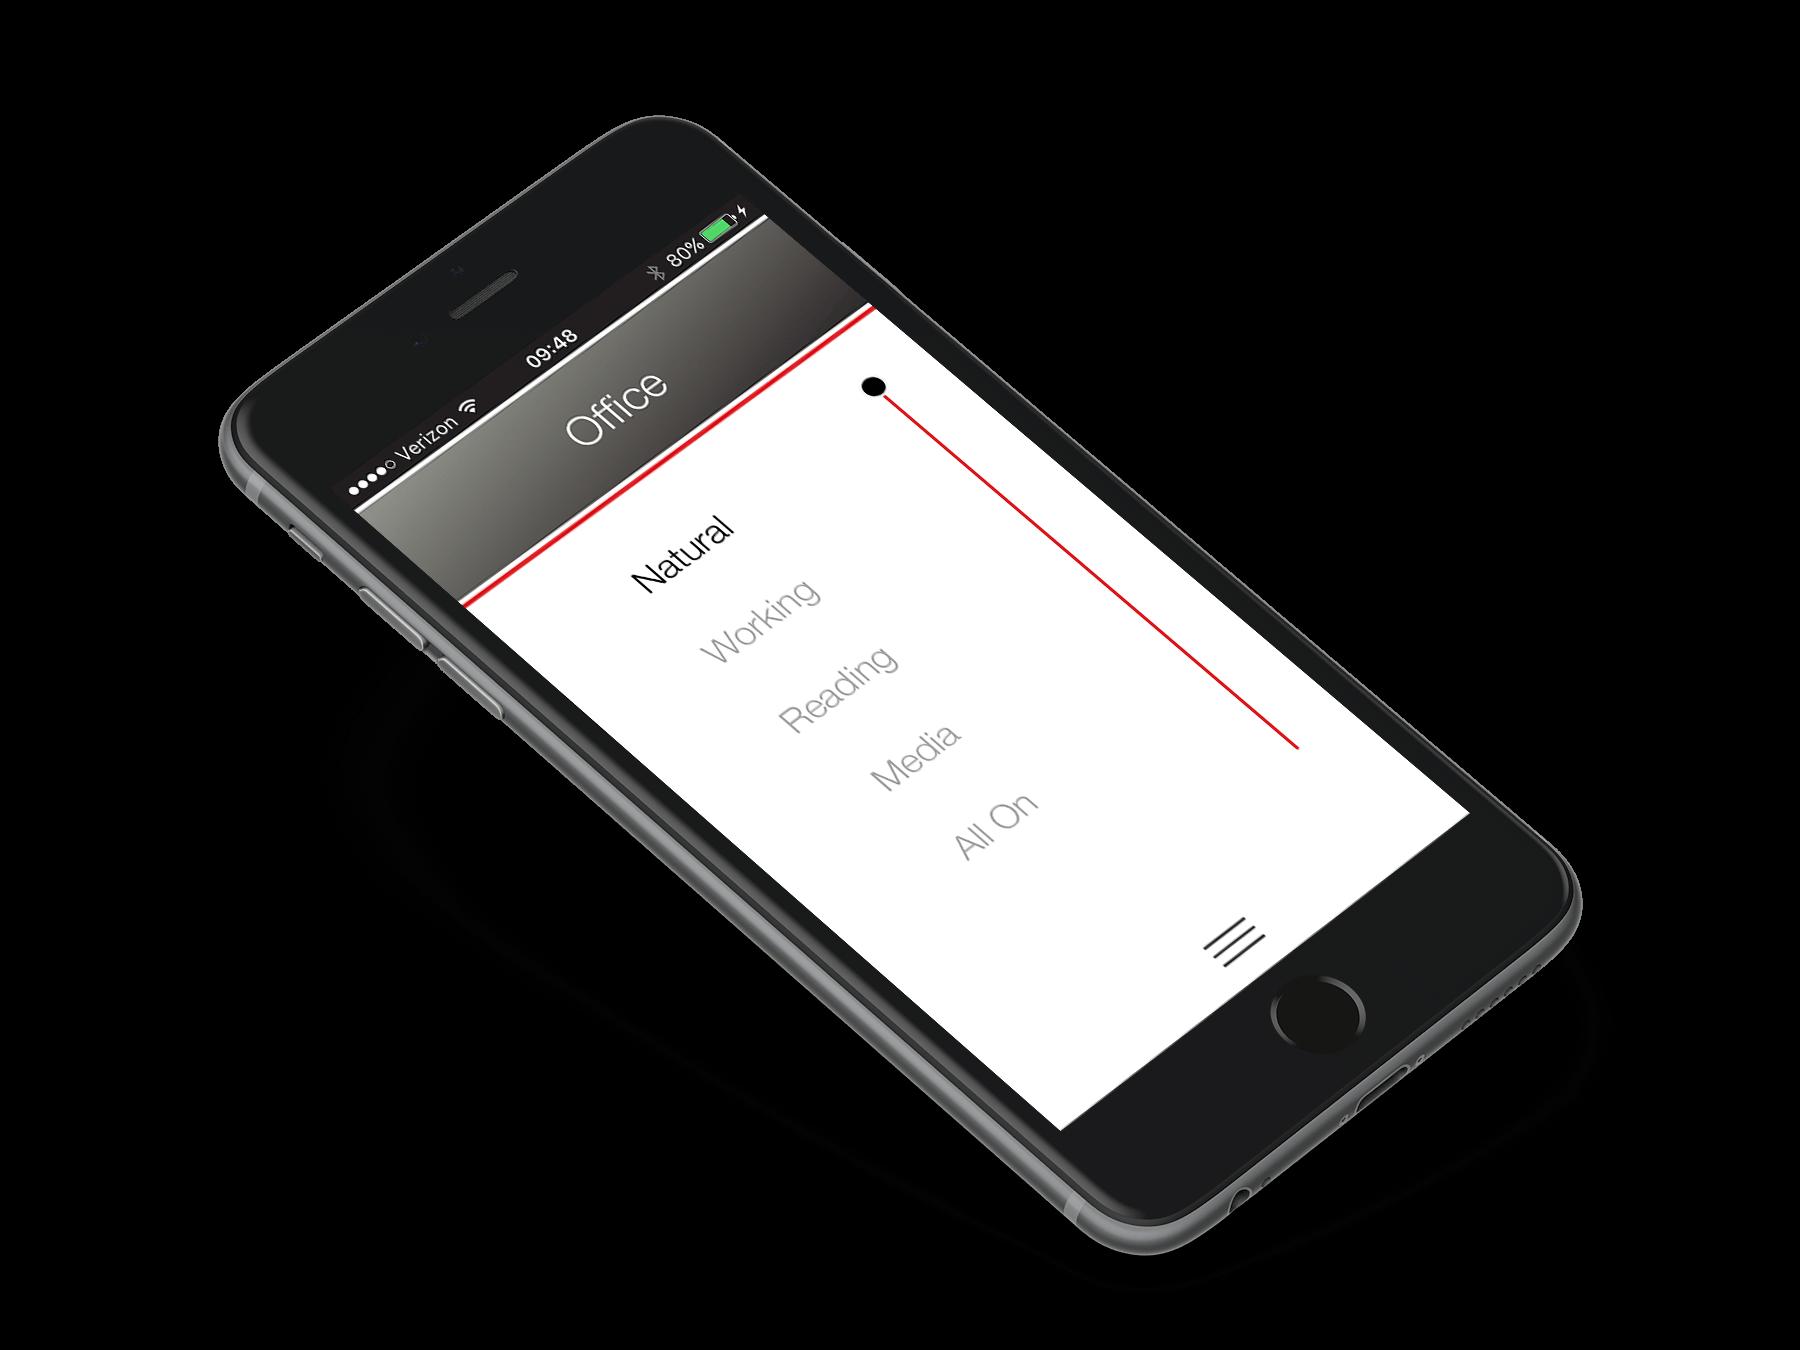 Ketra's Mobile App